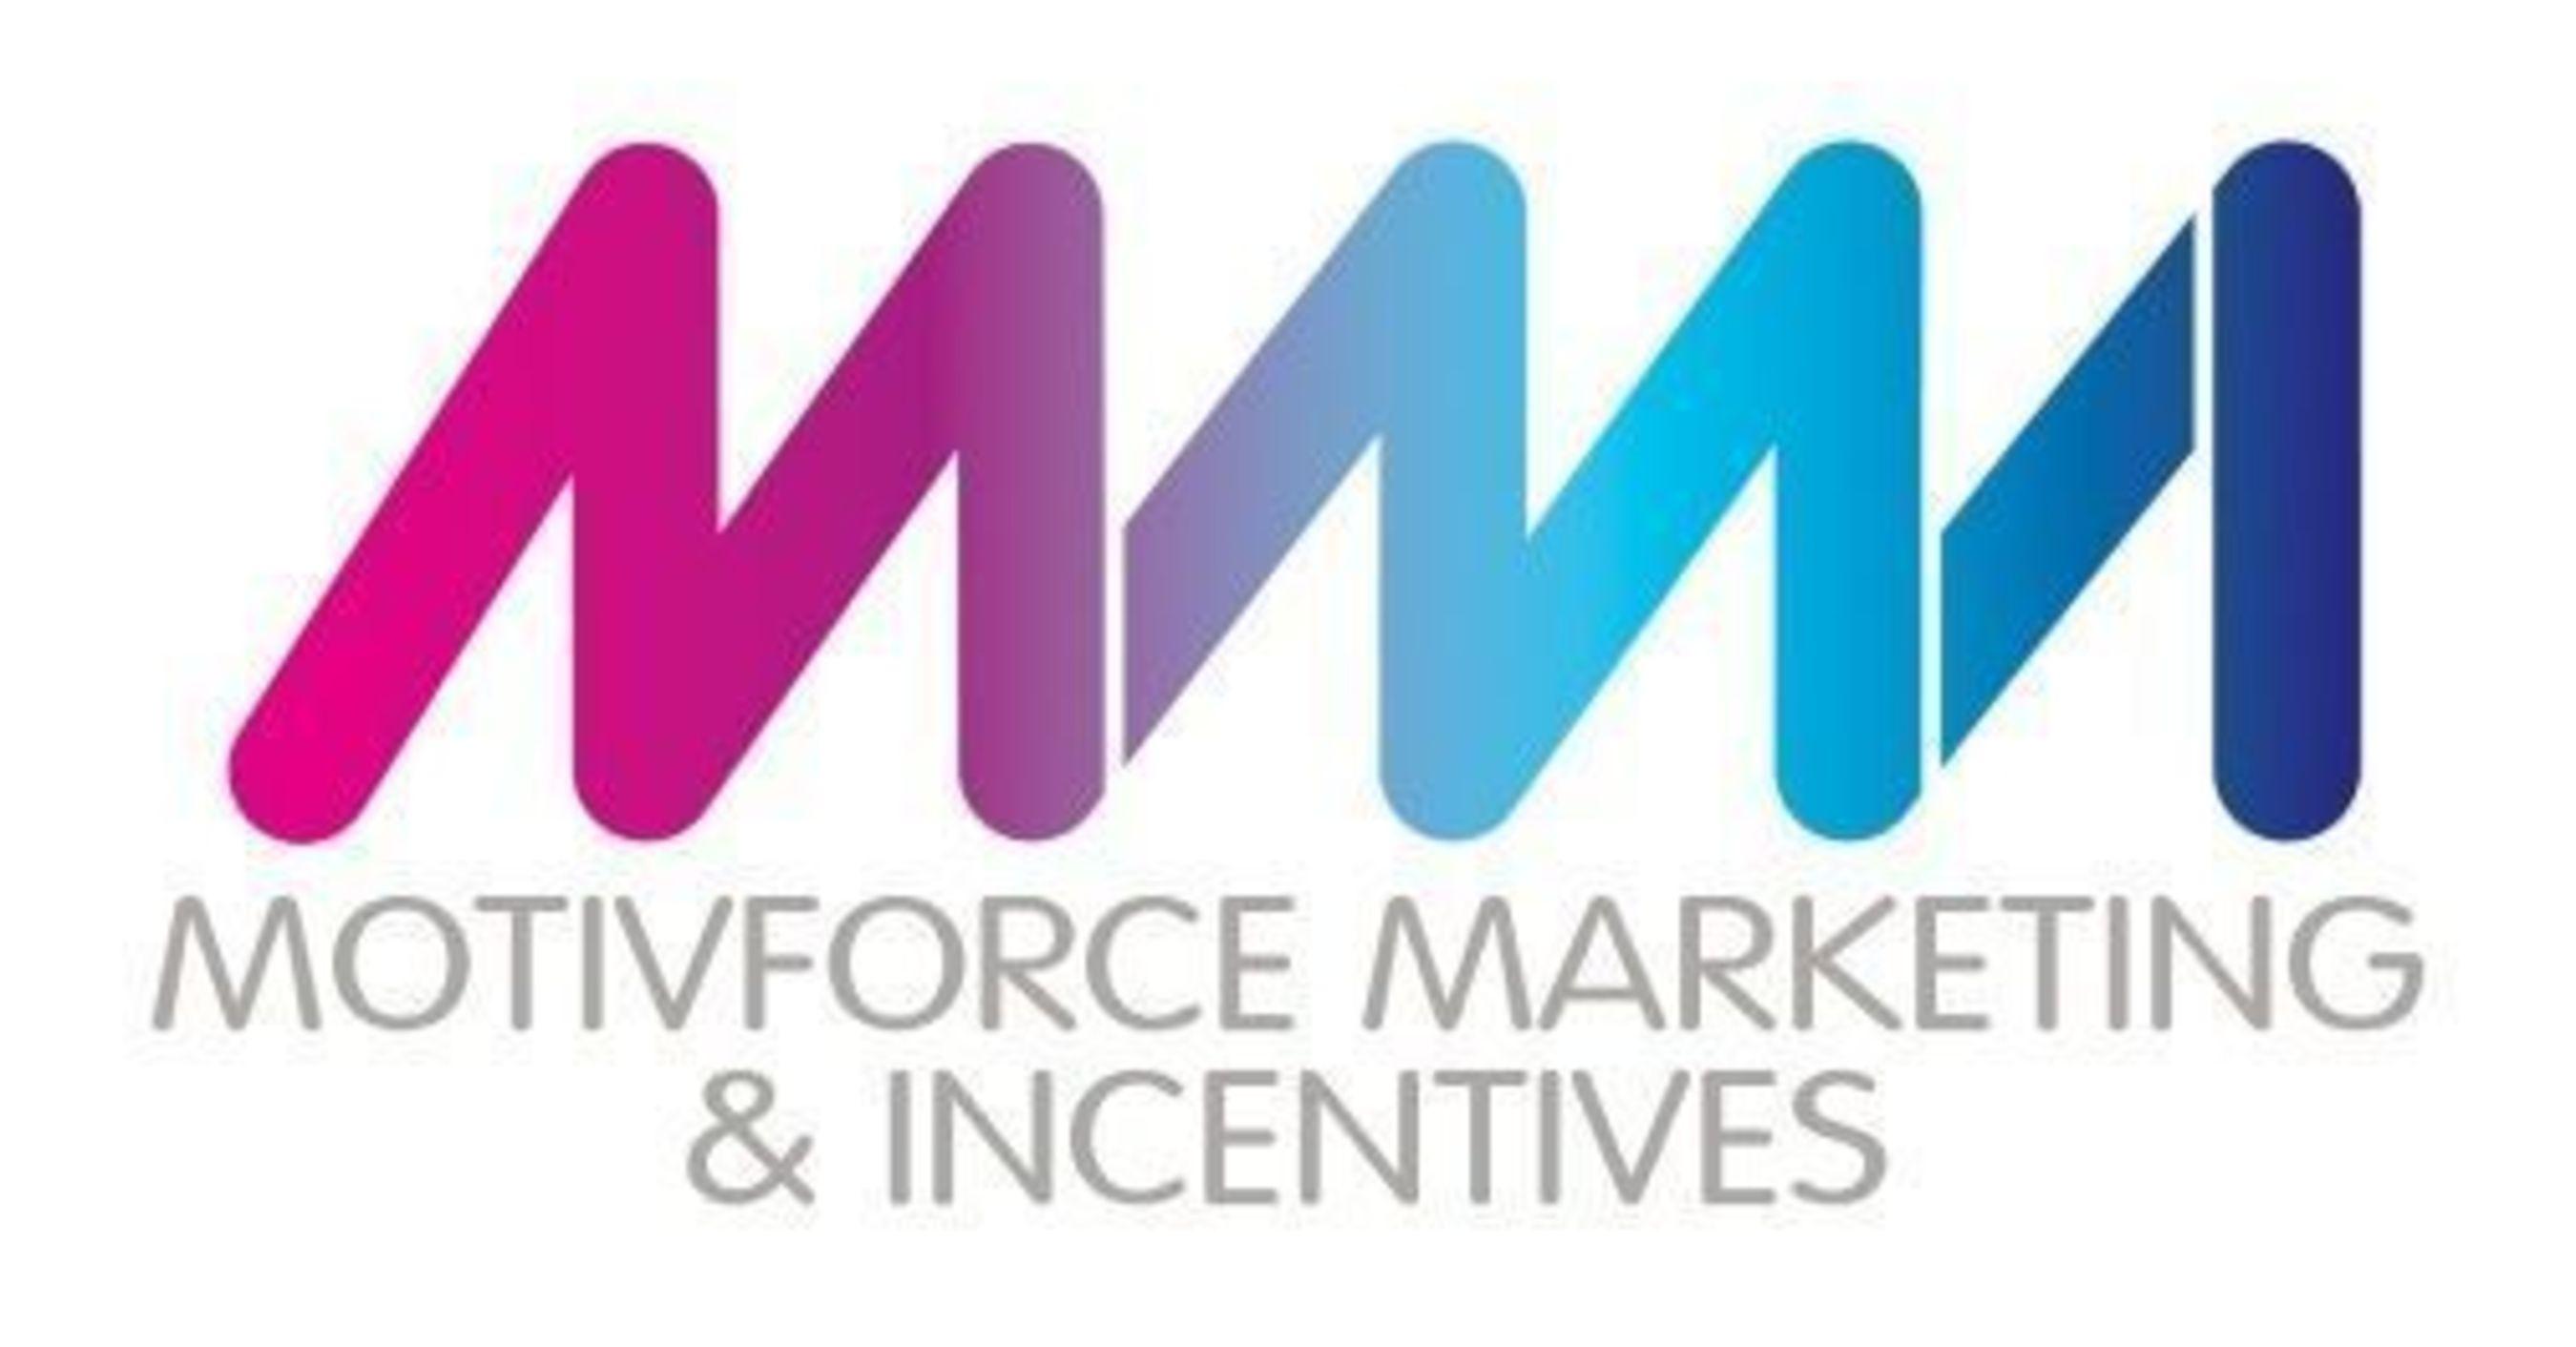 Winning Streak Continues for Motivforce - Best Channel Marketing Agency in CRN Awards